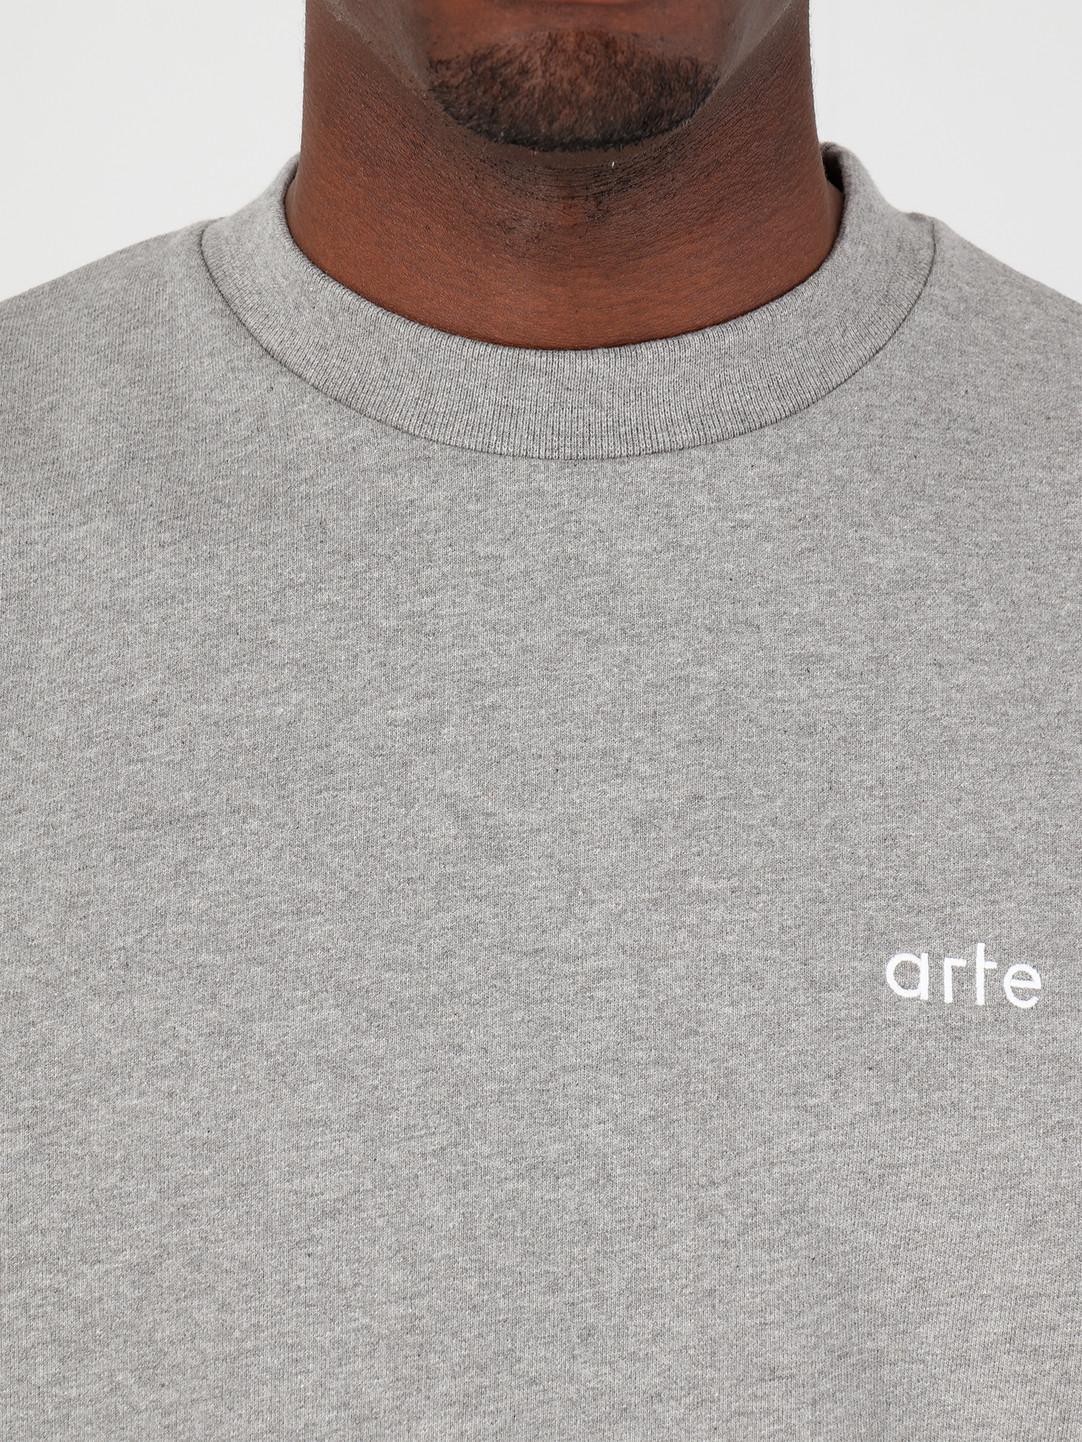 Arte Antwerp Arte Antwerp Chuck Logo Sweater Grey SS20-009C